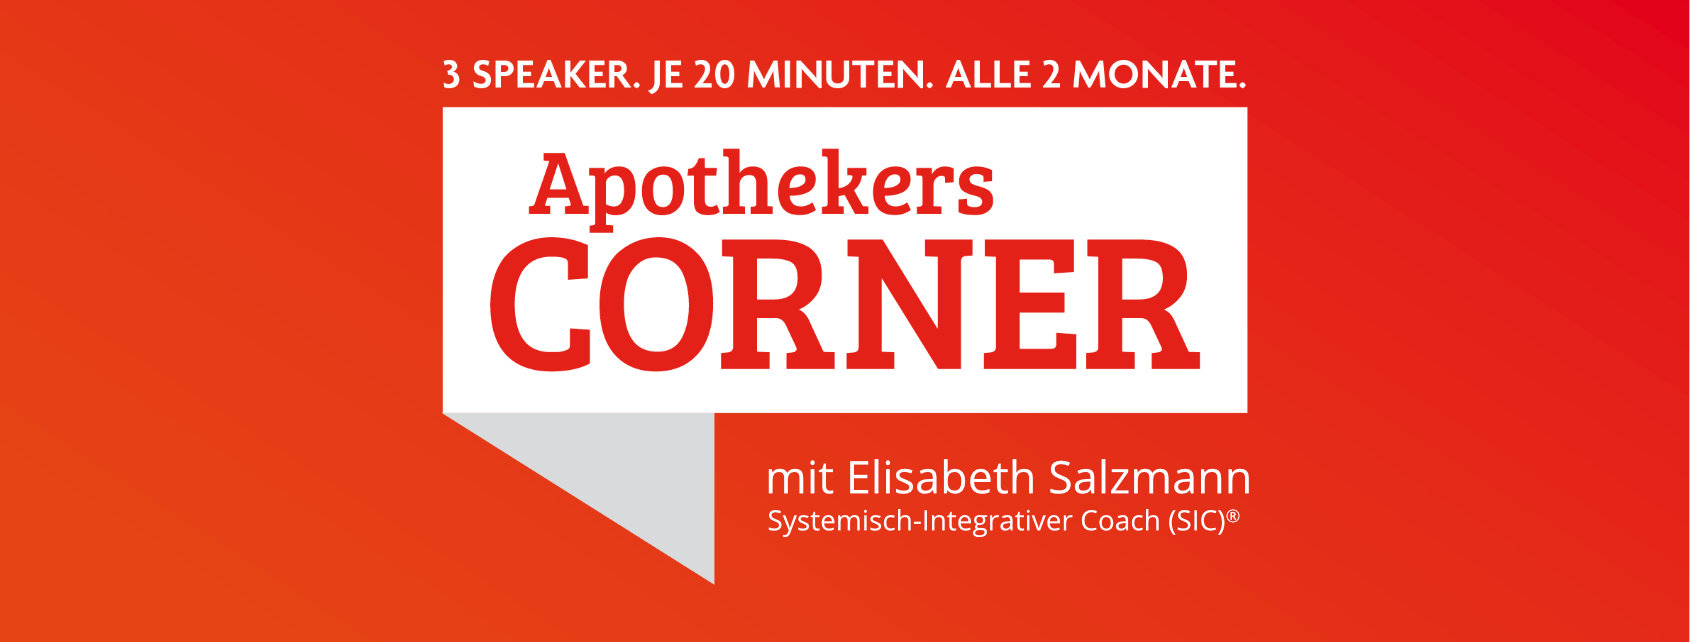 Apothekers Corner Logo